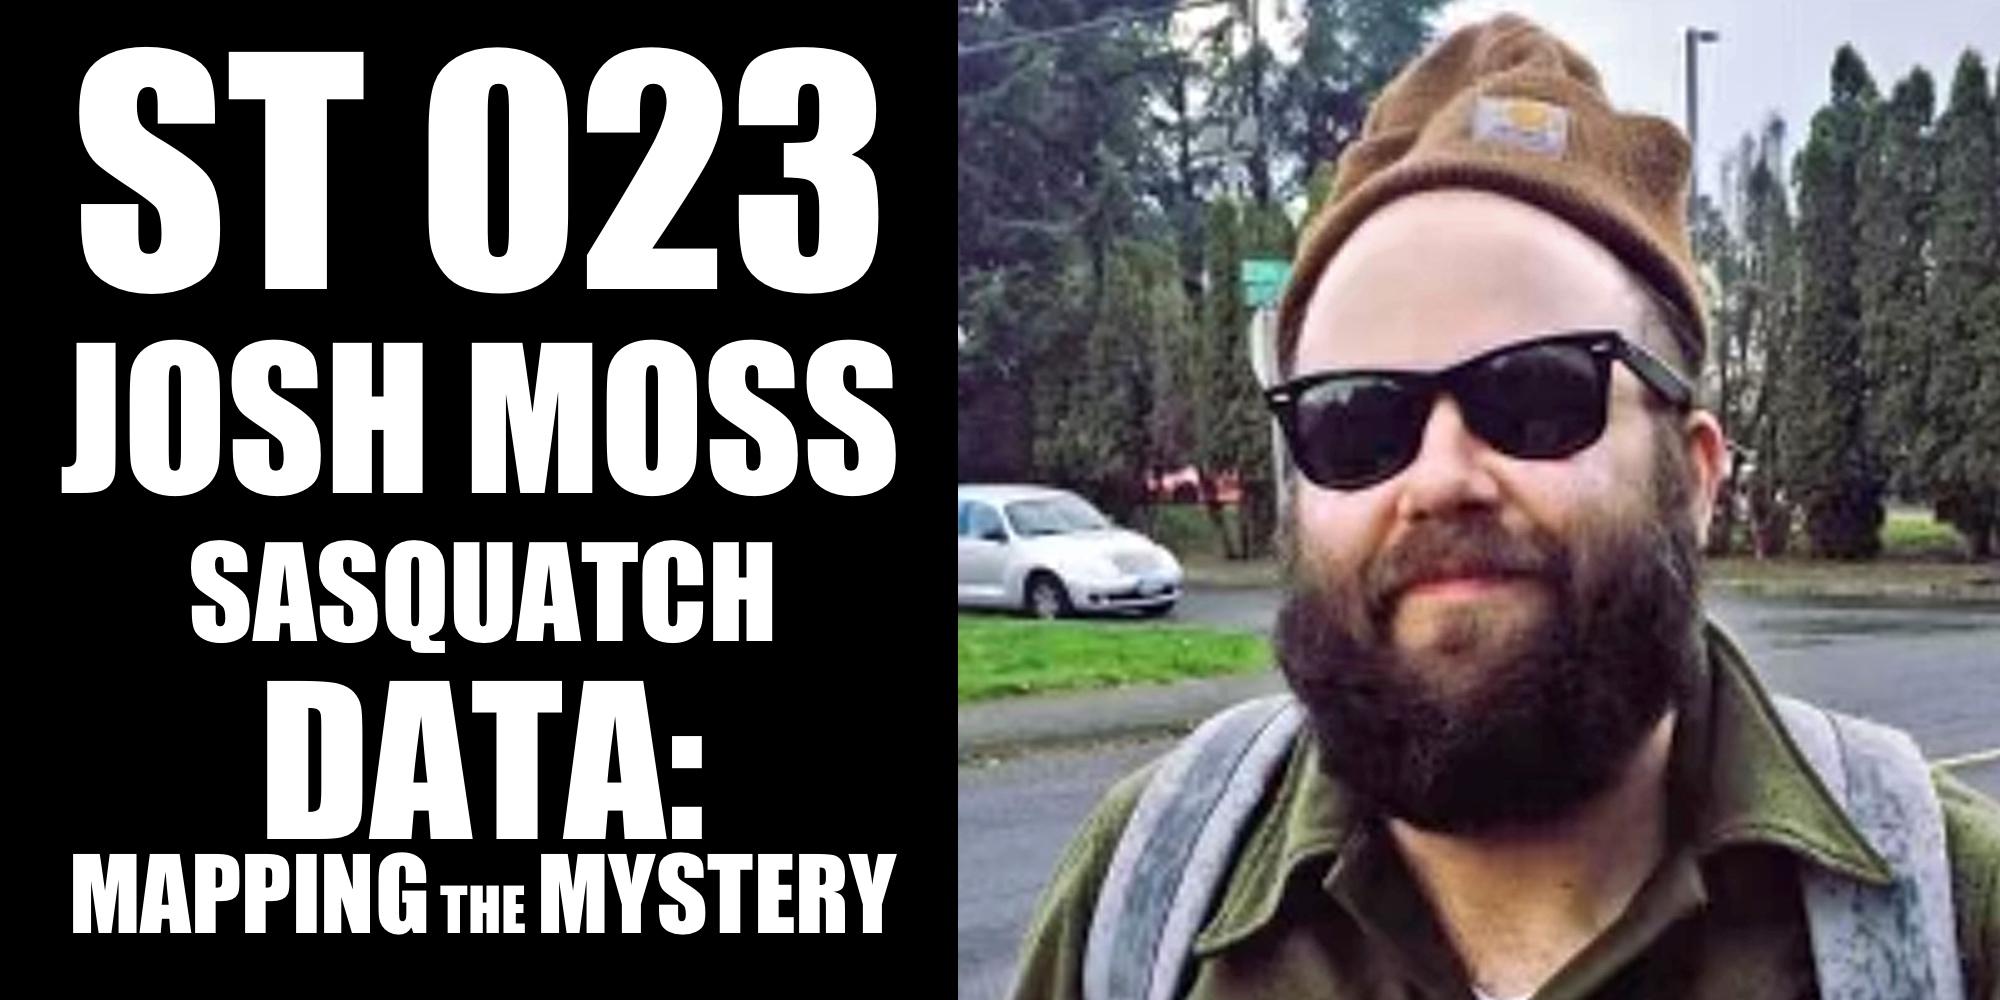 Josh Moss